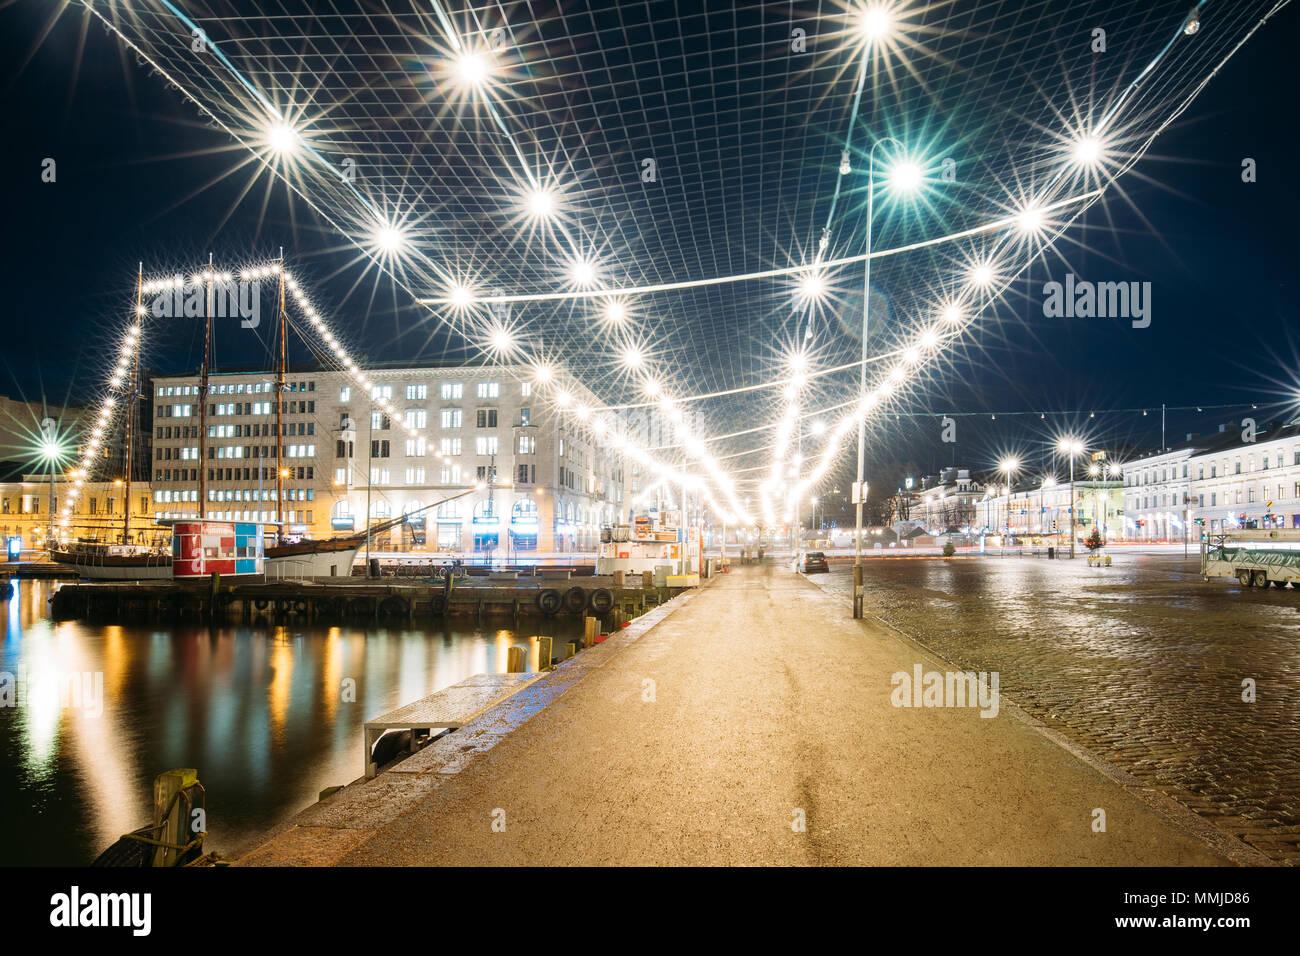 Helsinki, Finland. Evening Night Festive Christmas Xmas New Year Illuminations On Market Square. - Stock Image